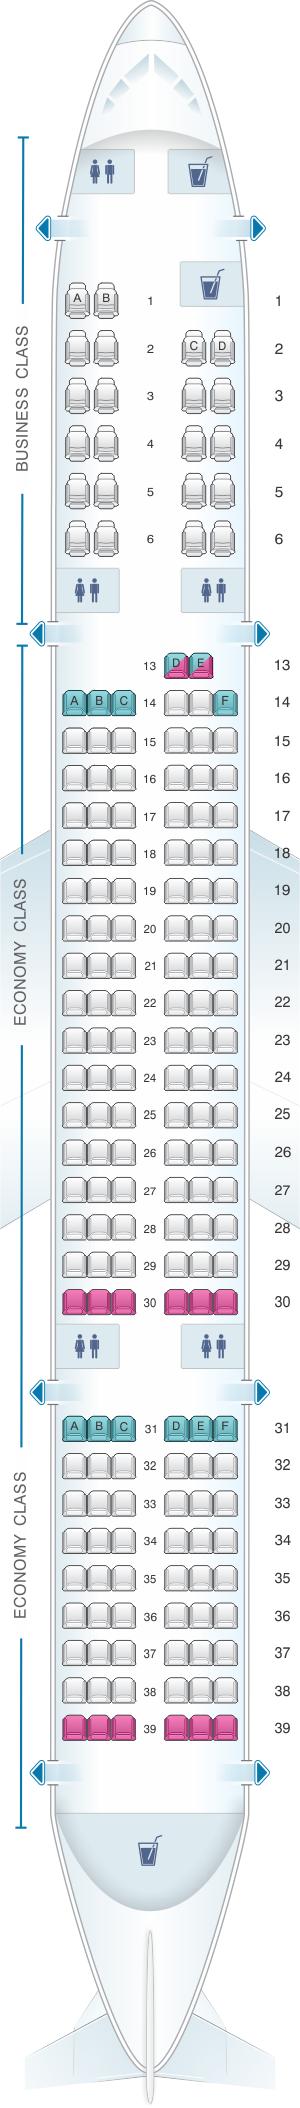 Seat map for Azal Azerbaijan Airlines Boeing B757 200